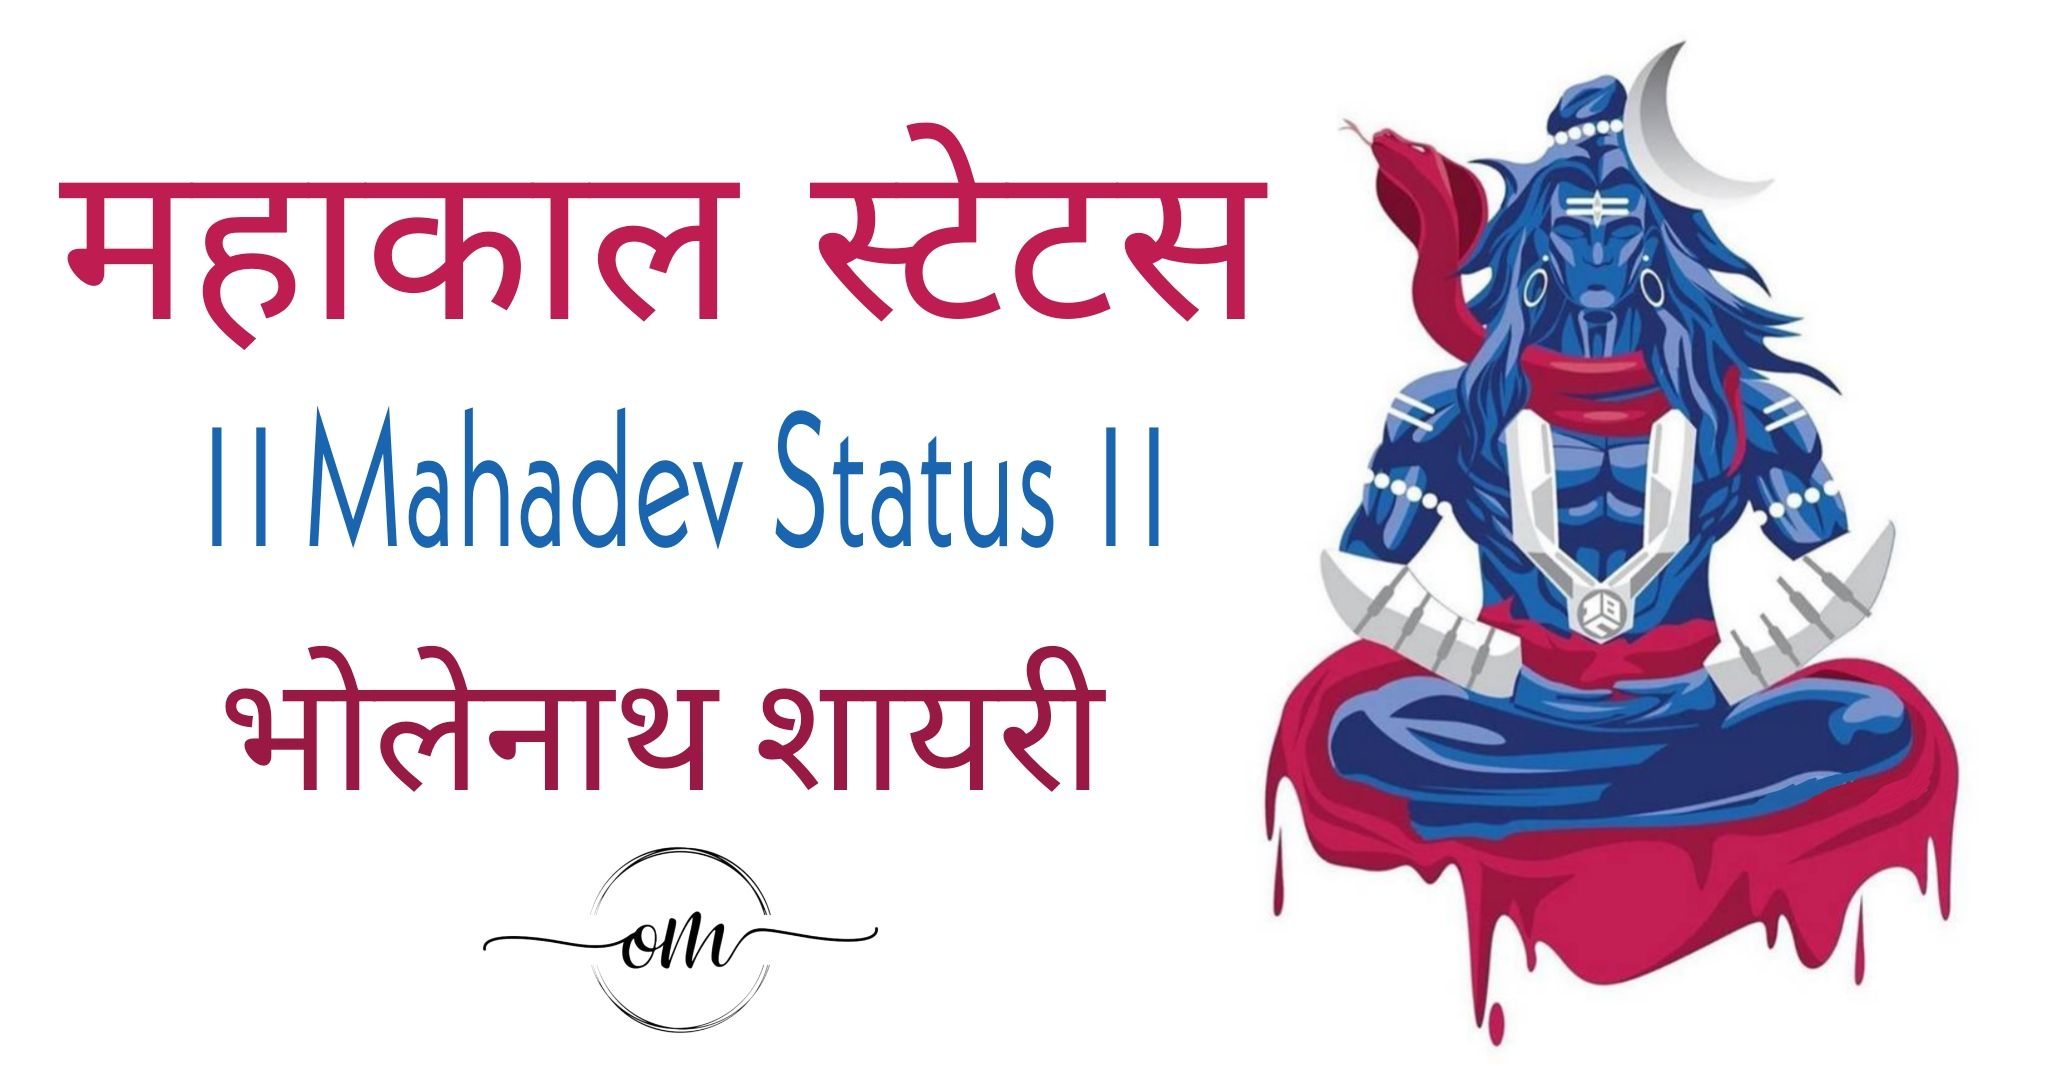 Mahadev Quotes, Mahakal Status in Hindi, Mahadev Quotes in Hindi, Bholenaath Status